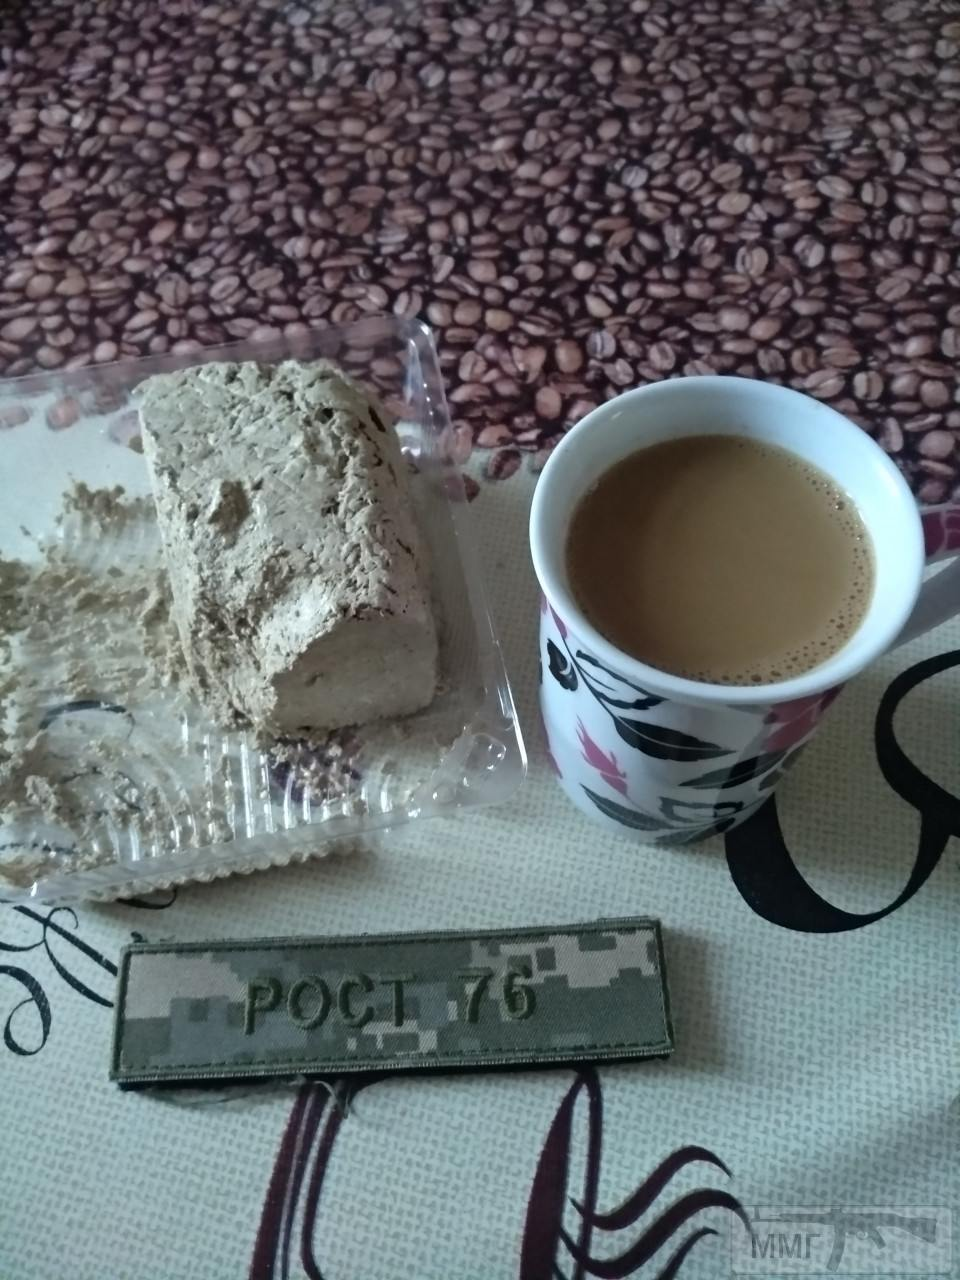 83355 - Копарські дні і будні.